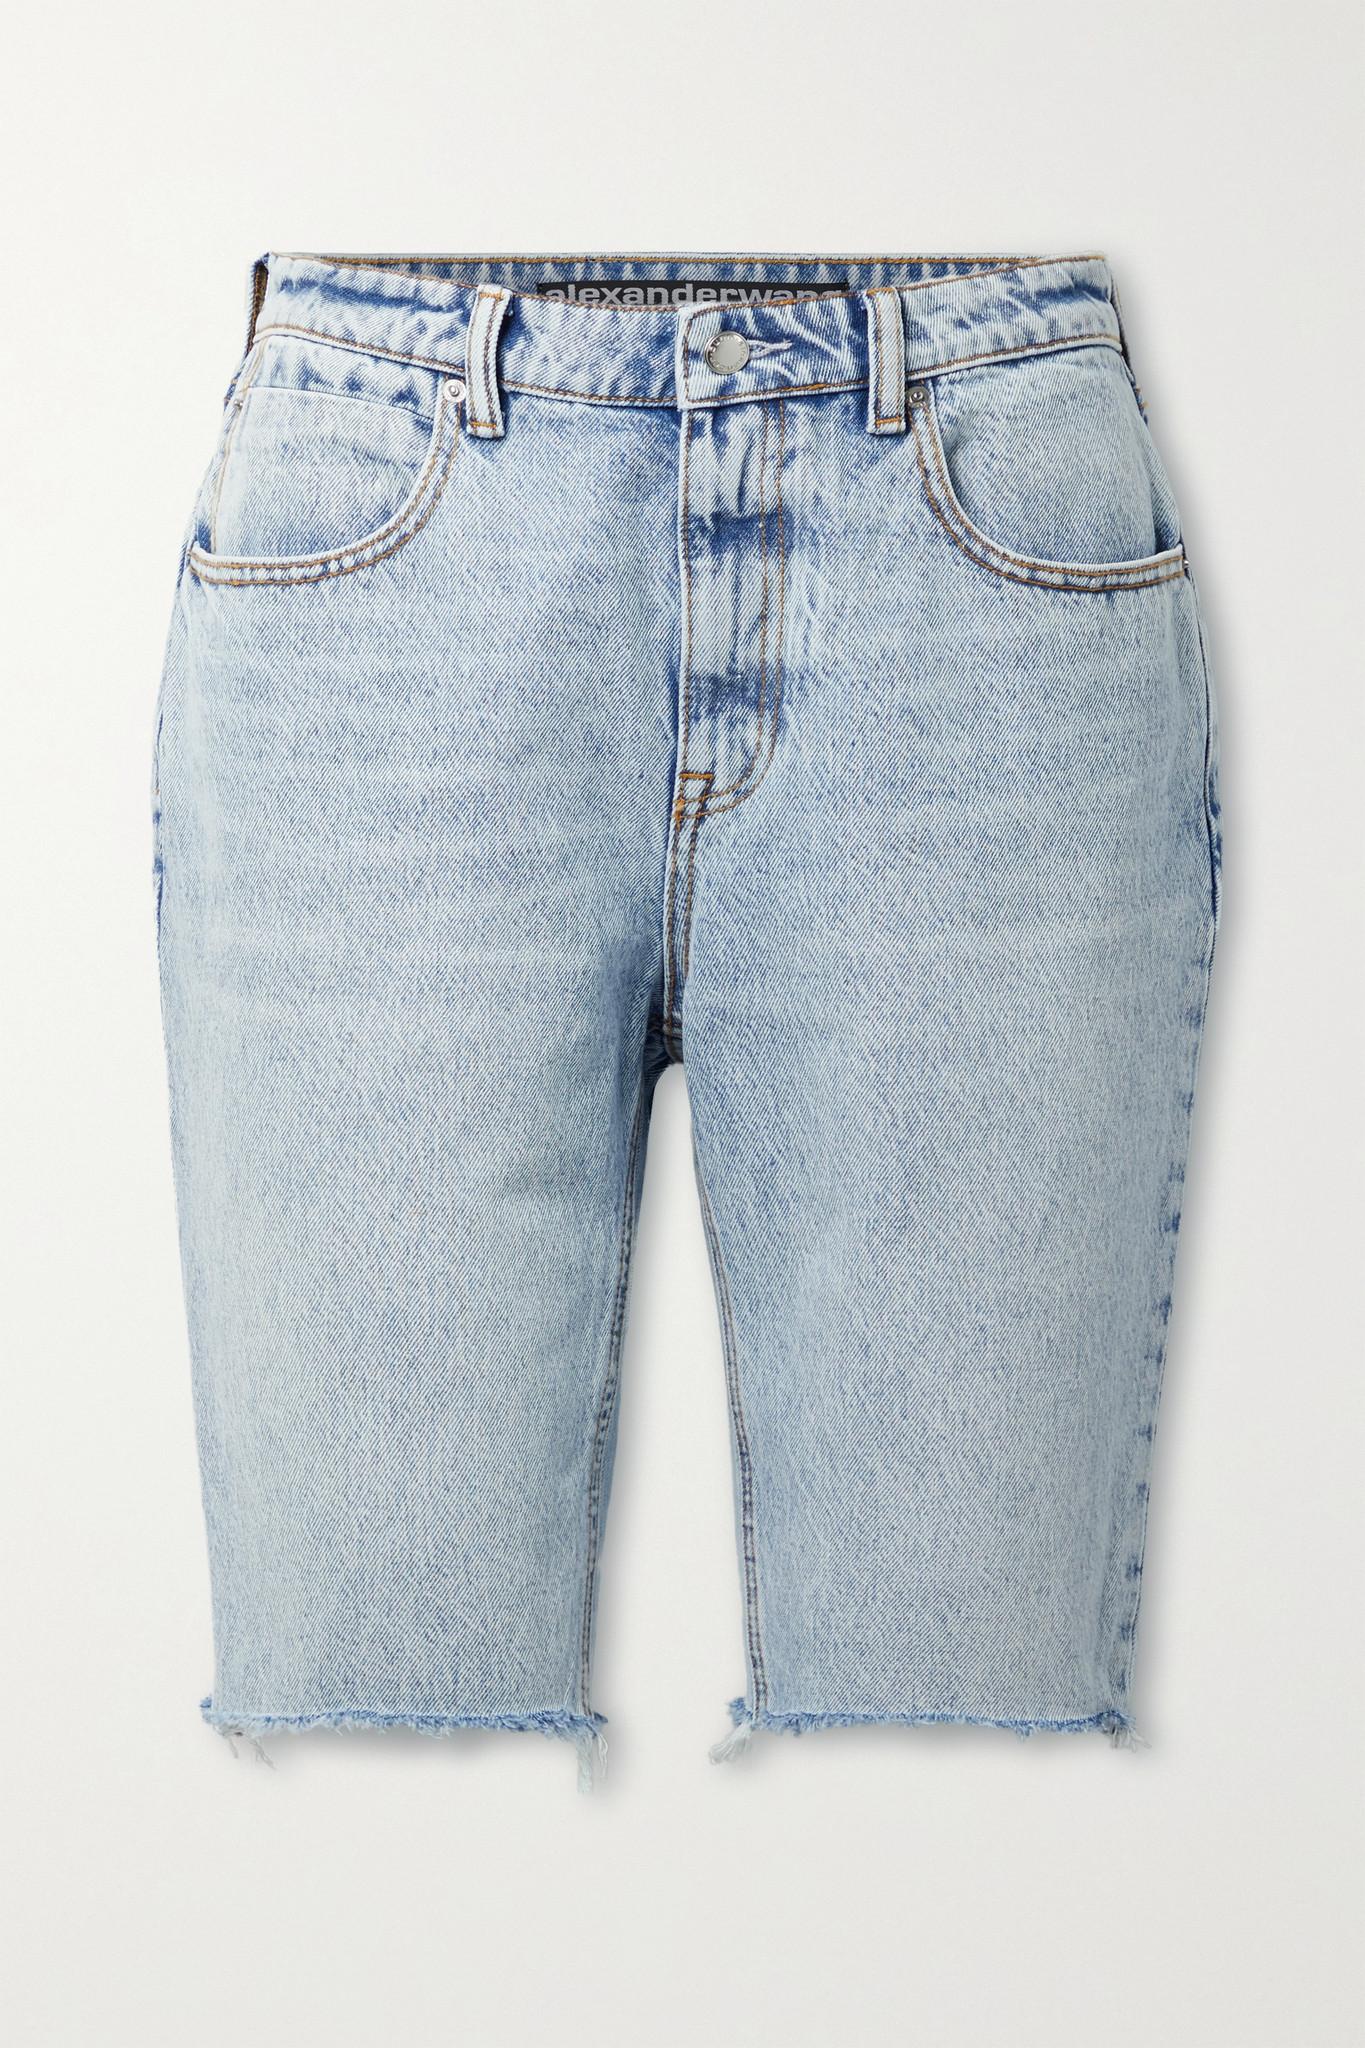 ALEXANDER WANG - Distressed Denim Shorts - Blue - 25